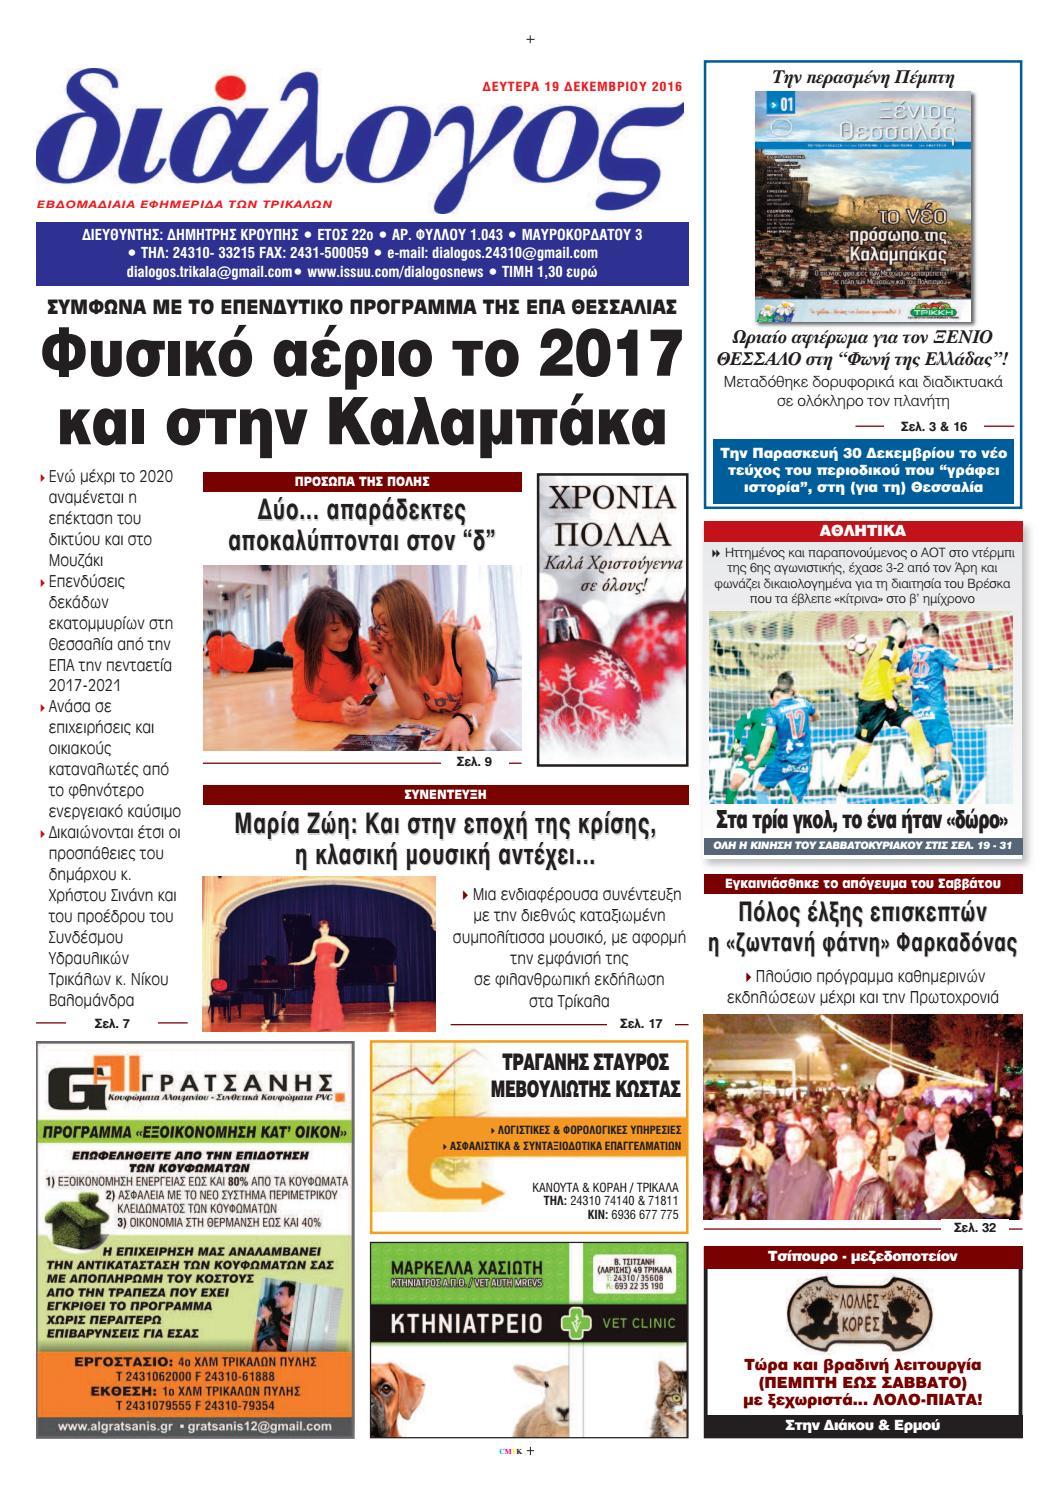 1c2bf1f1bc Dialogos 19 12 2016 by διάλογος (dialogos) - issuu